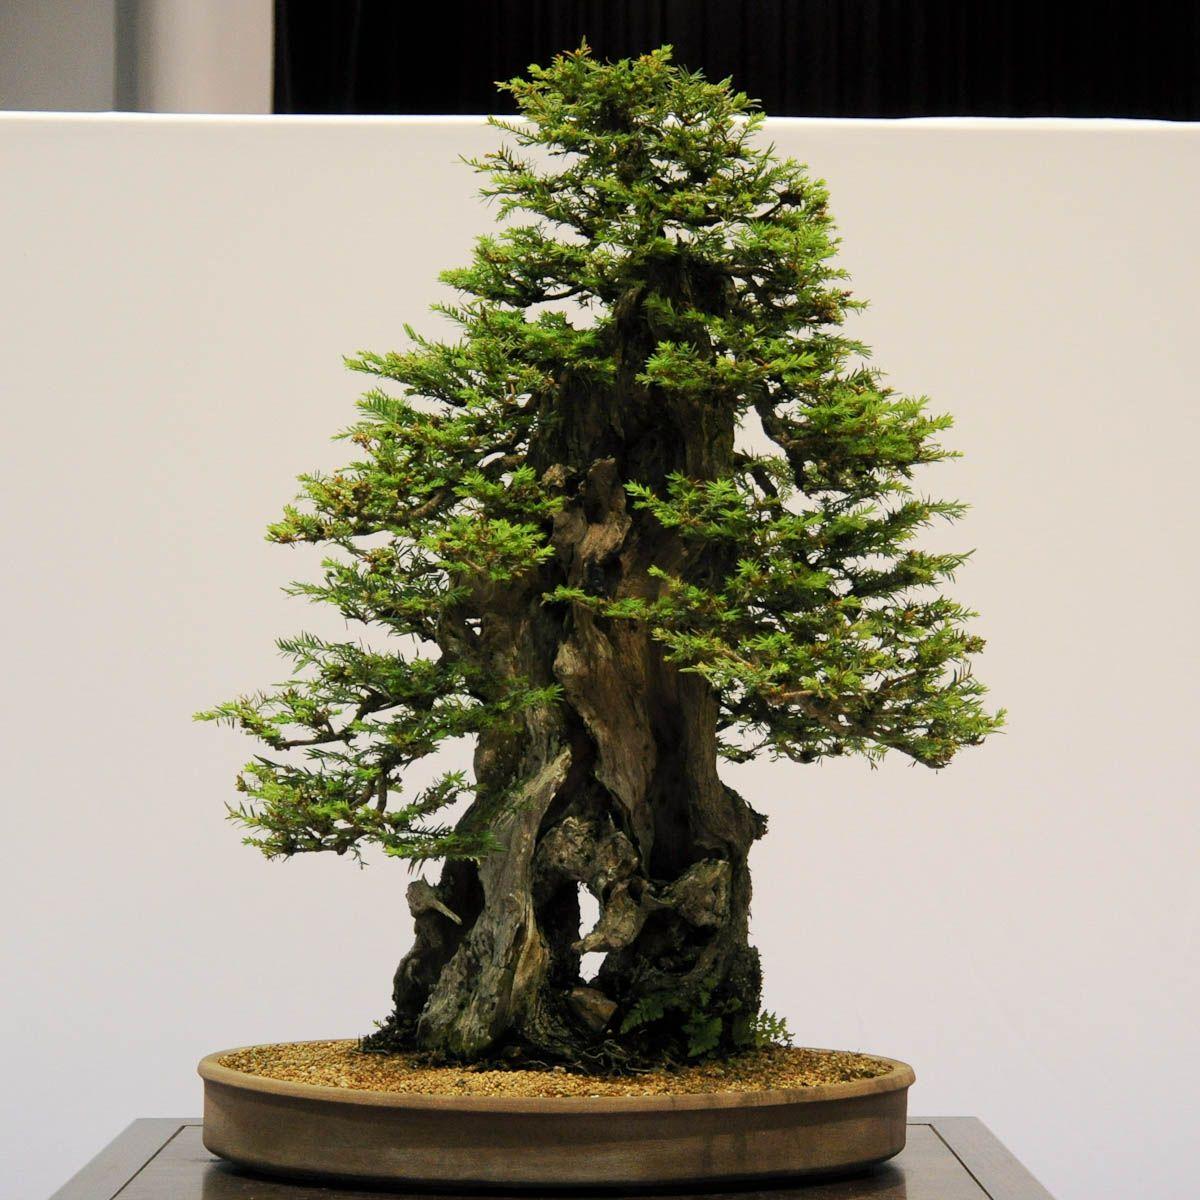 Mendocino Coast Bonsai Bonsai Tree Redwood Bonsai Bonsai Tree Types